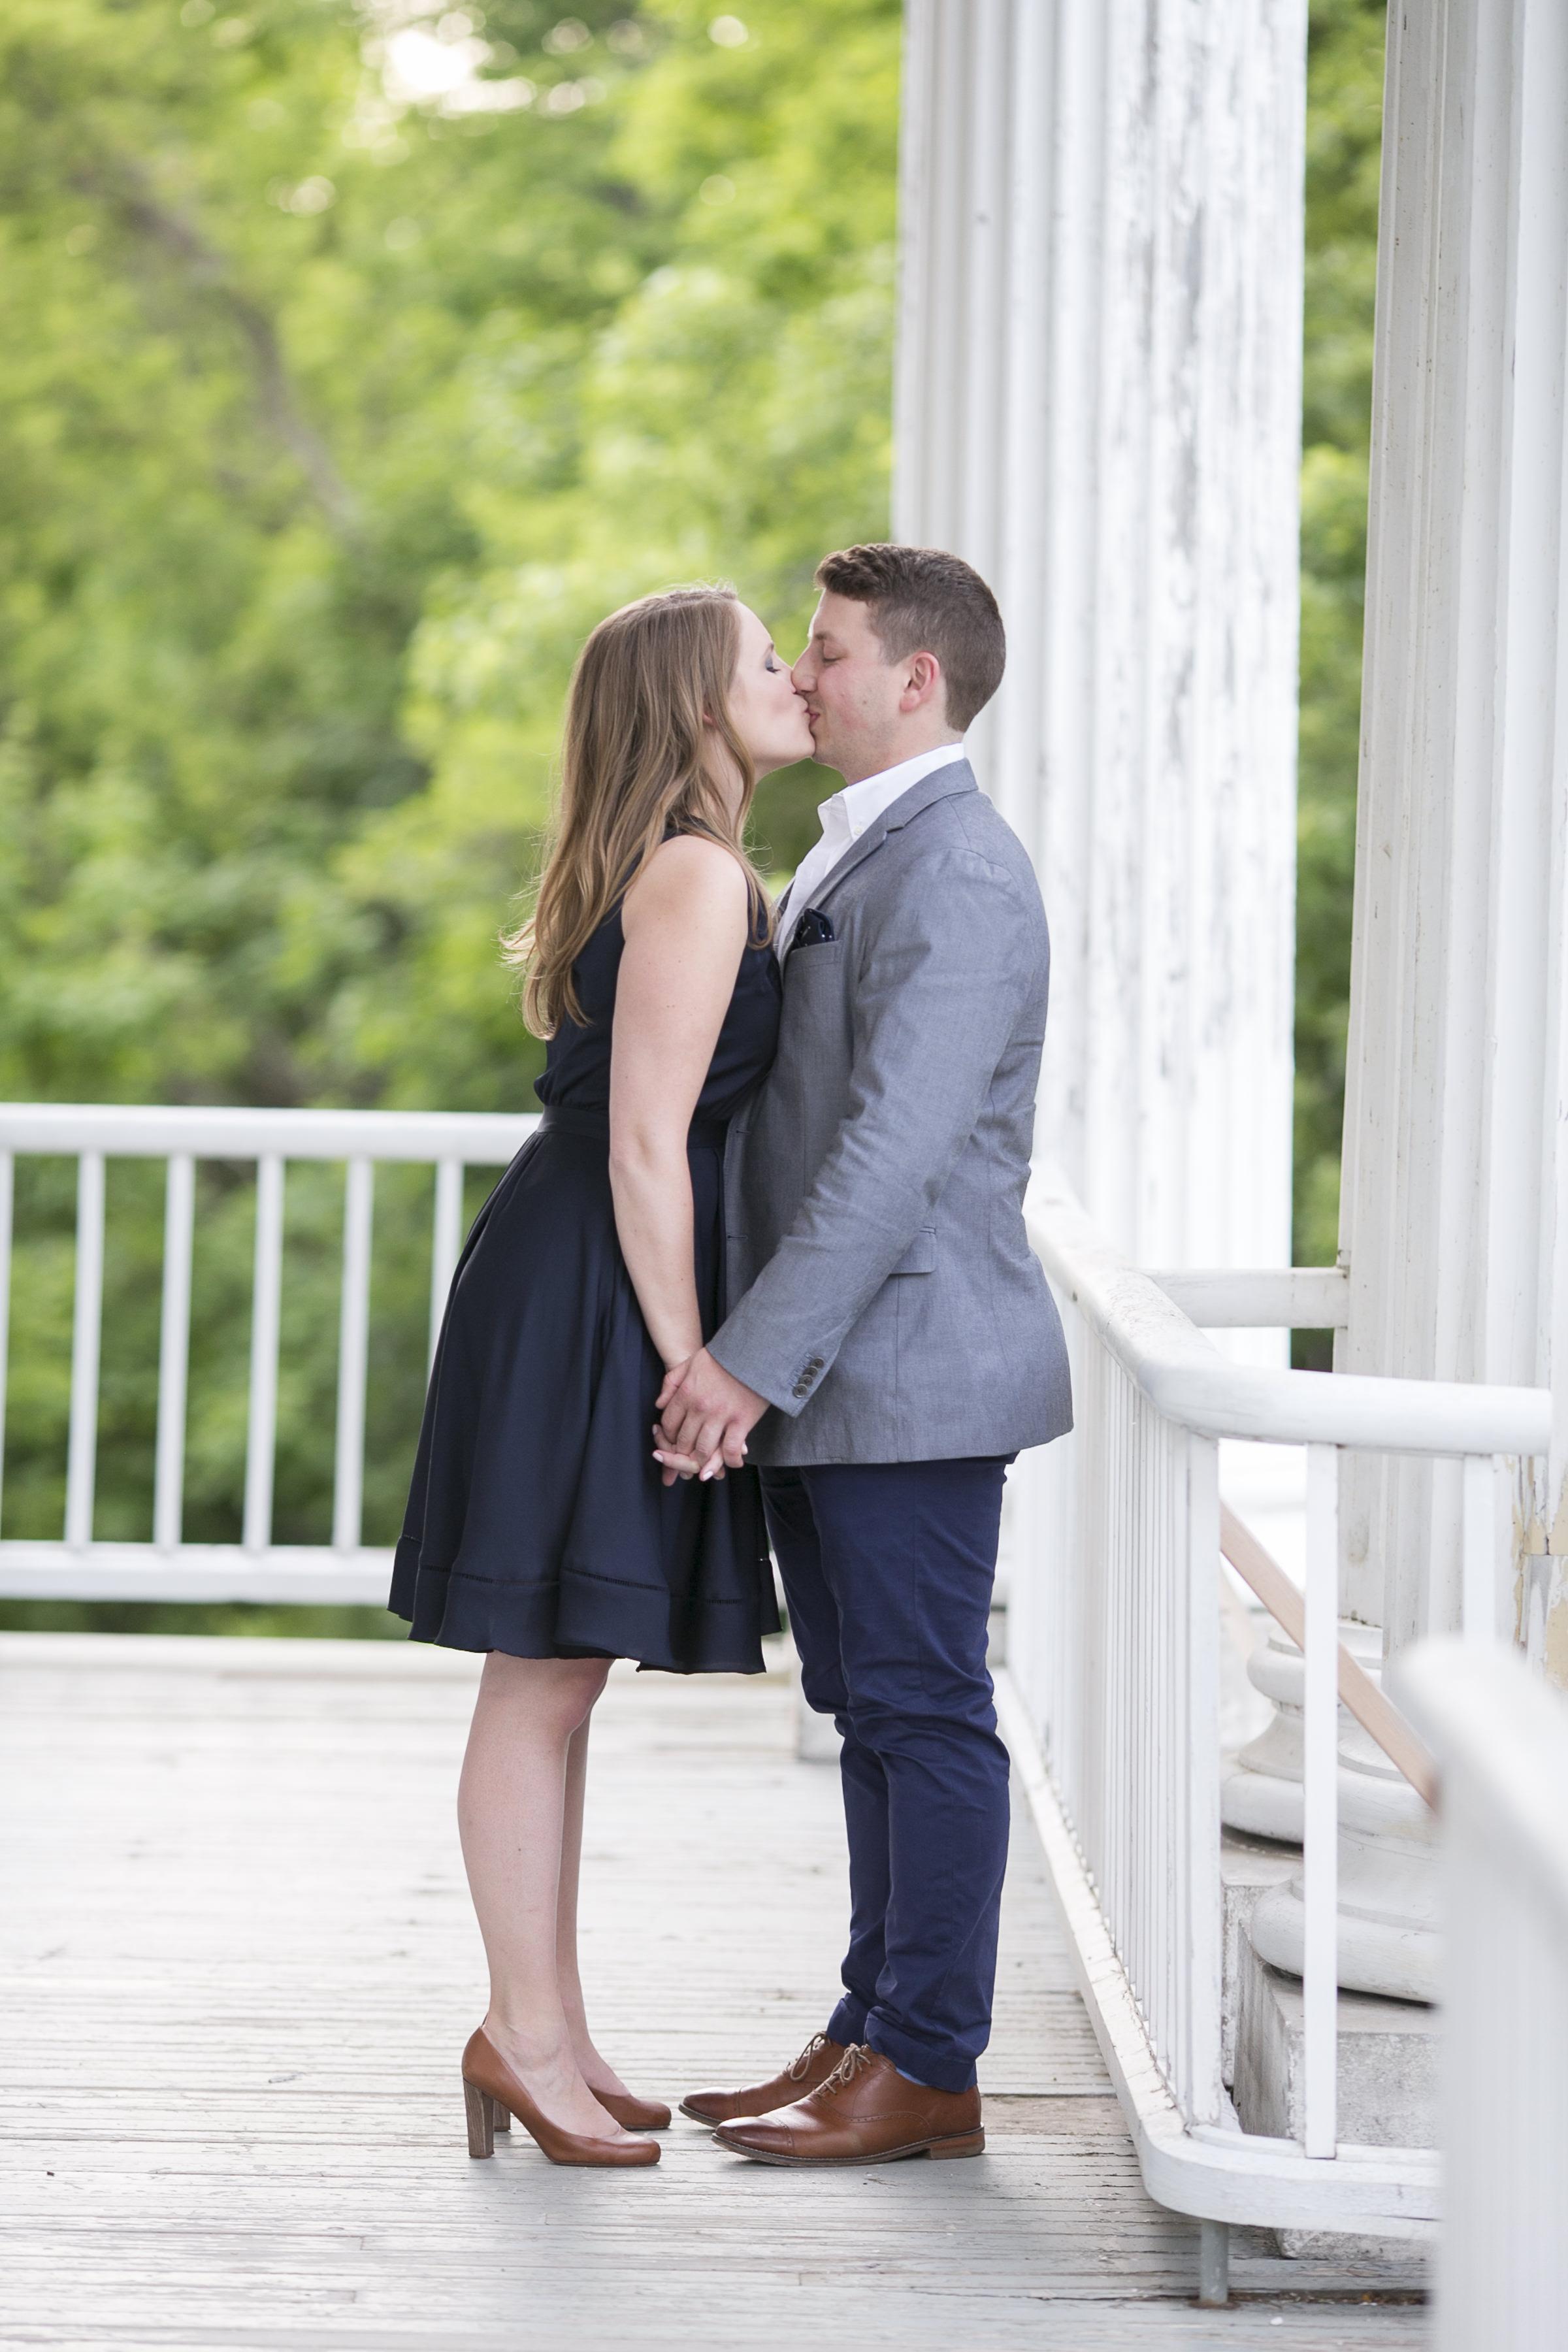 Niagara-on-the-Lake-Summer-Engagement-photos-by-Philosophy-Studios012.JPG